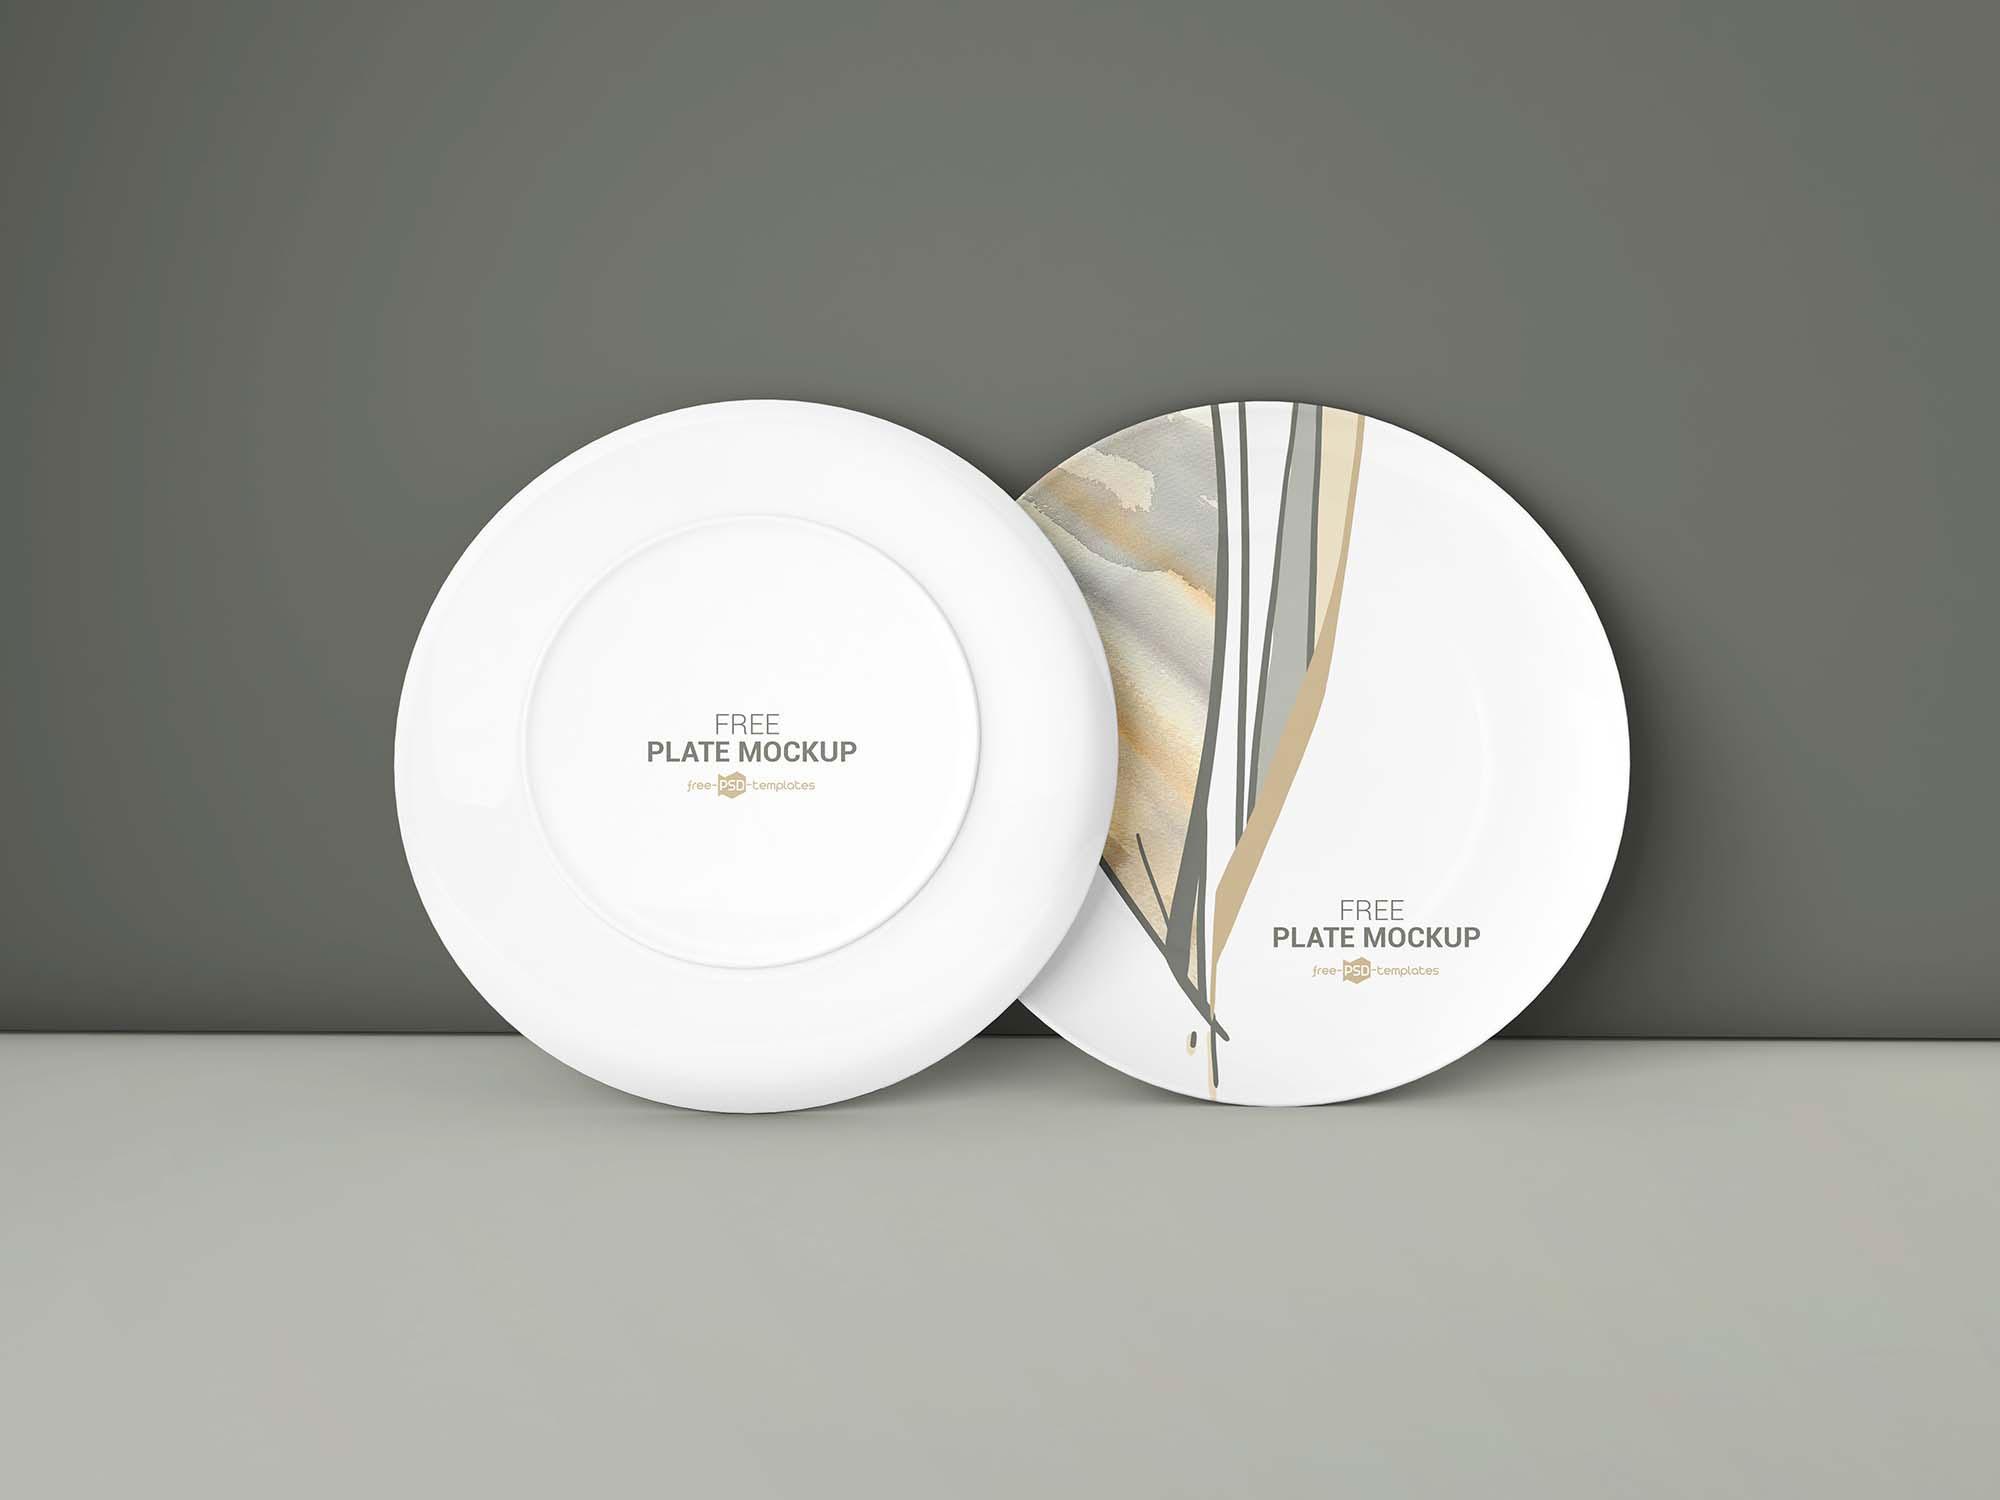 2 Plate Mockups